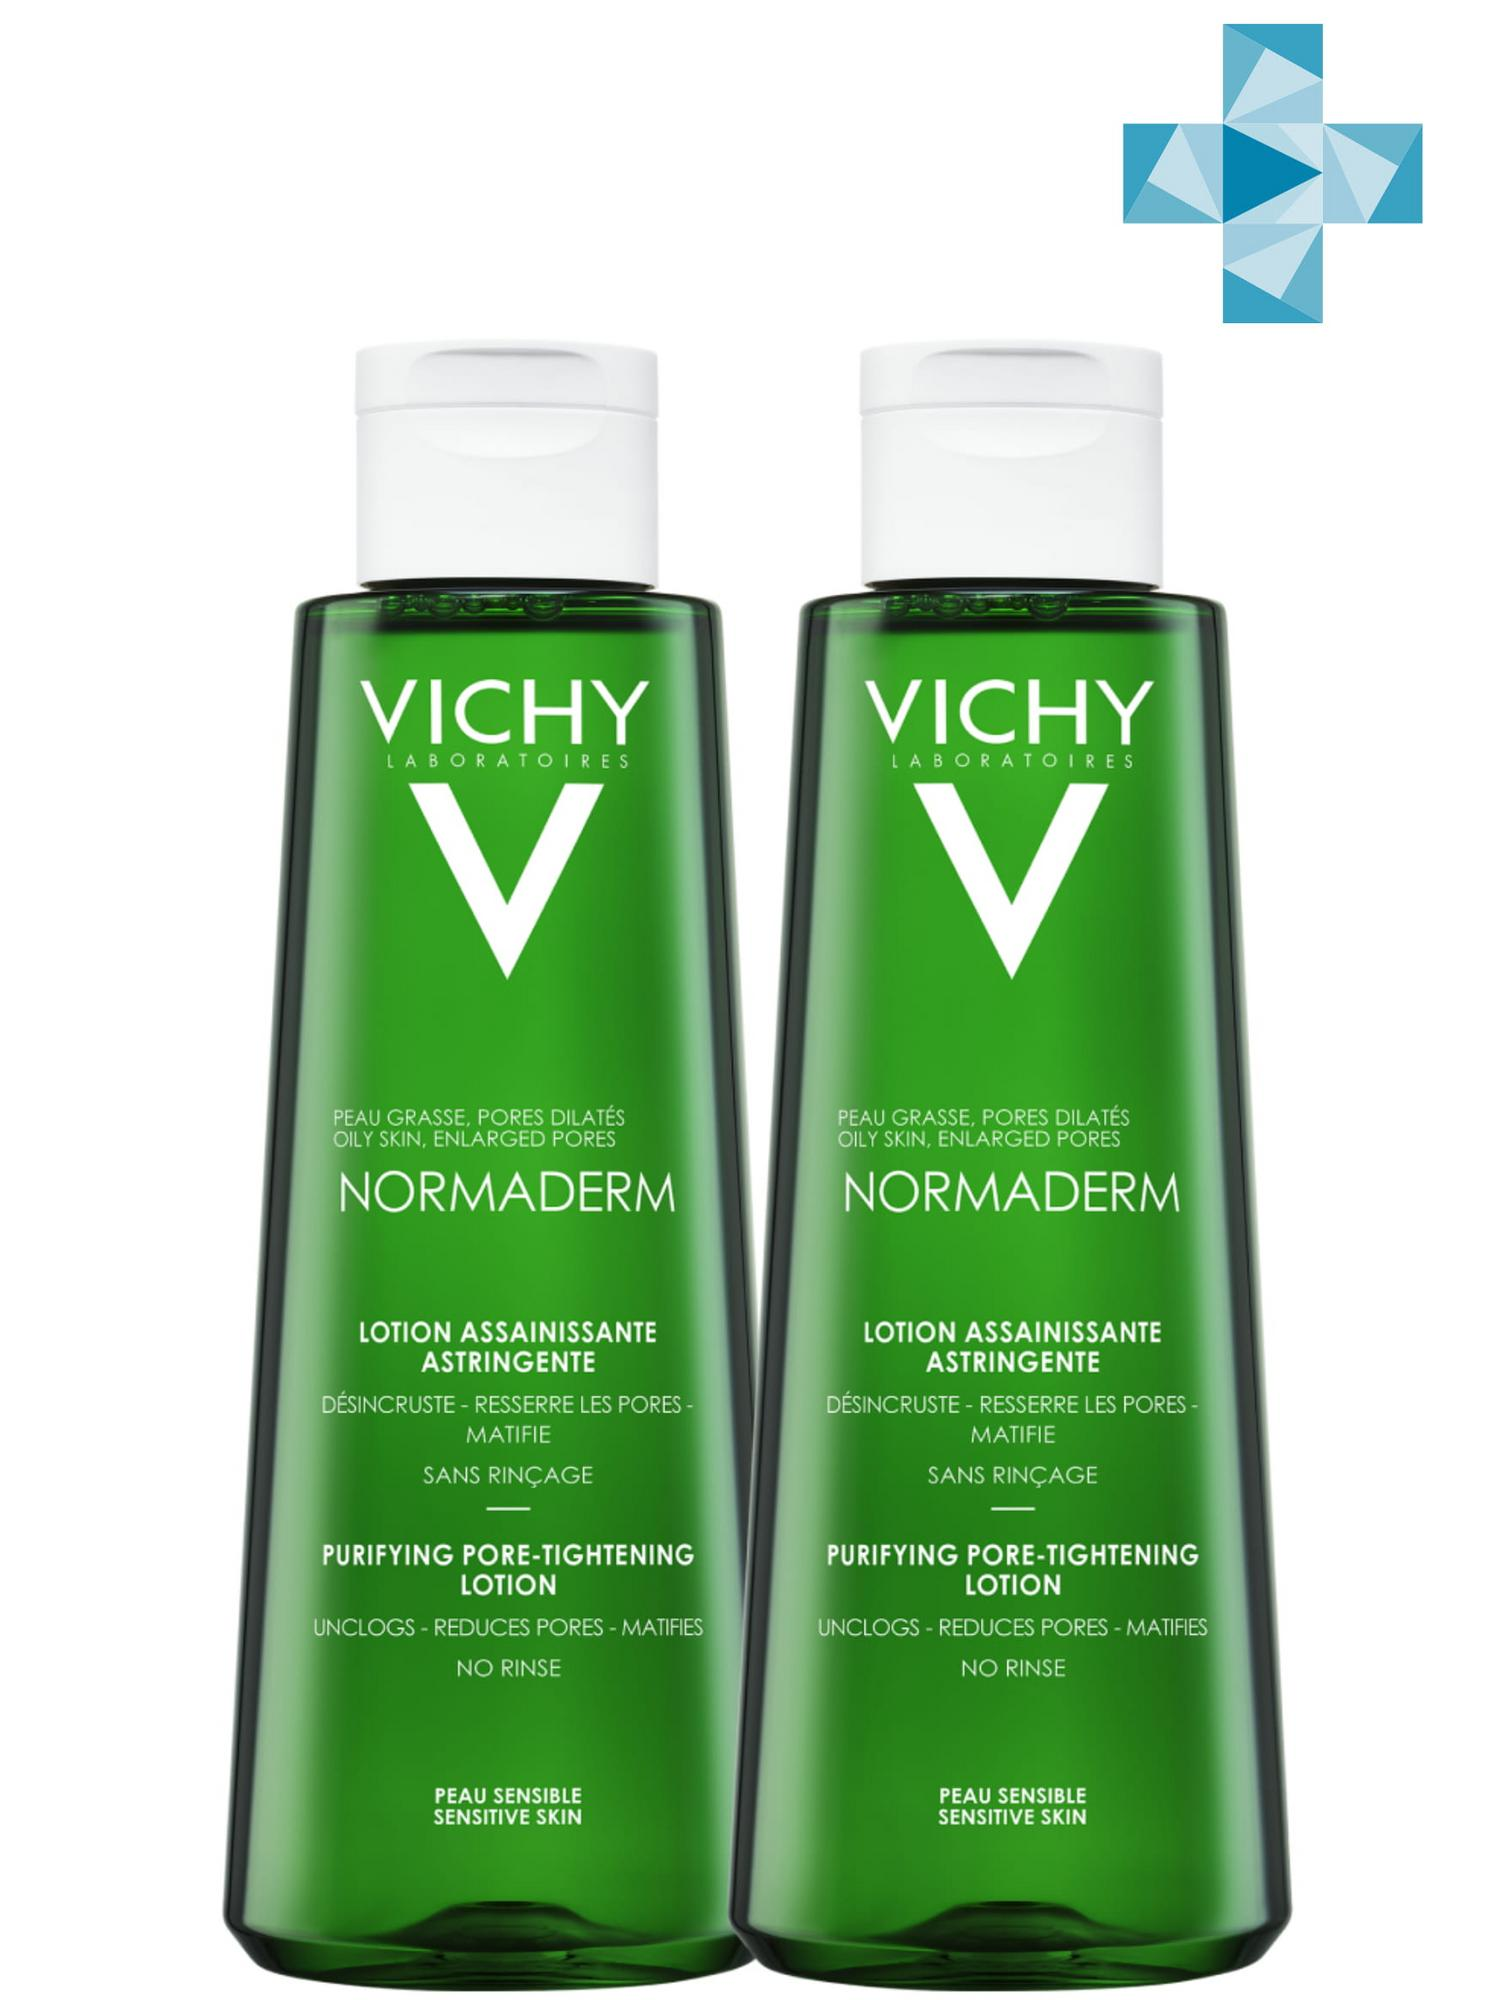 Купить Vichy Комплект Нормадерм Лосьон Тоник, сужающий поры, 2х200 мл (Vichy, Normaderm), Франция